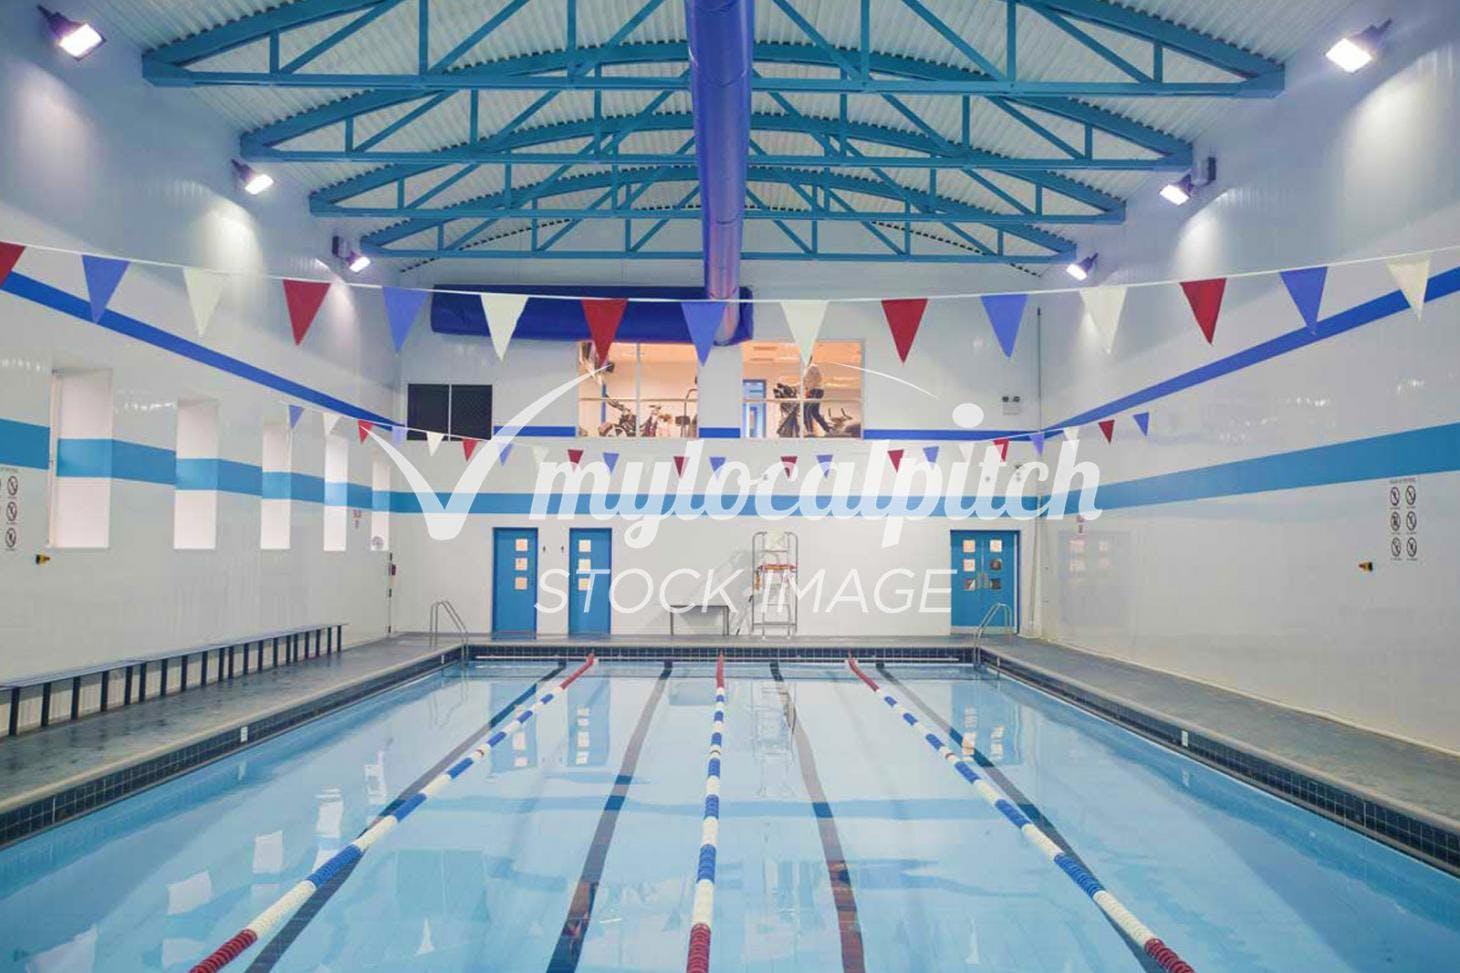 dlr Meadowbrook Indoor swimming pool